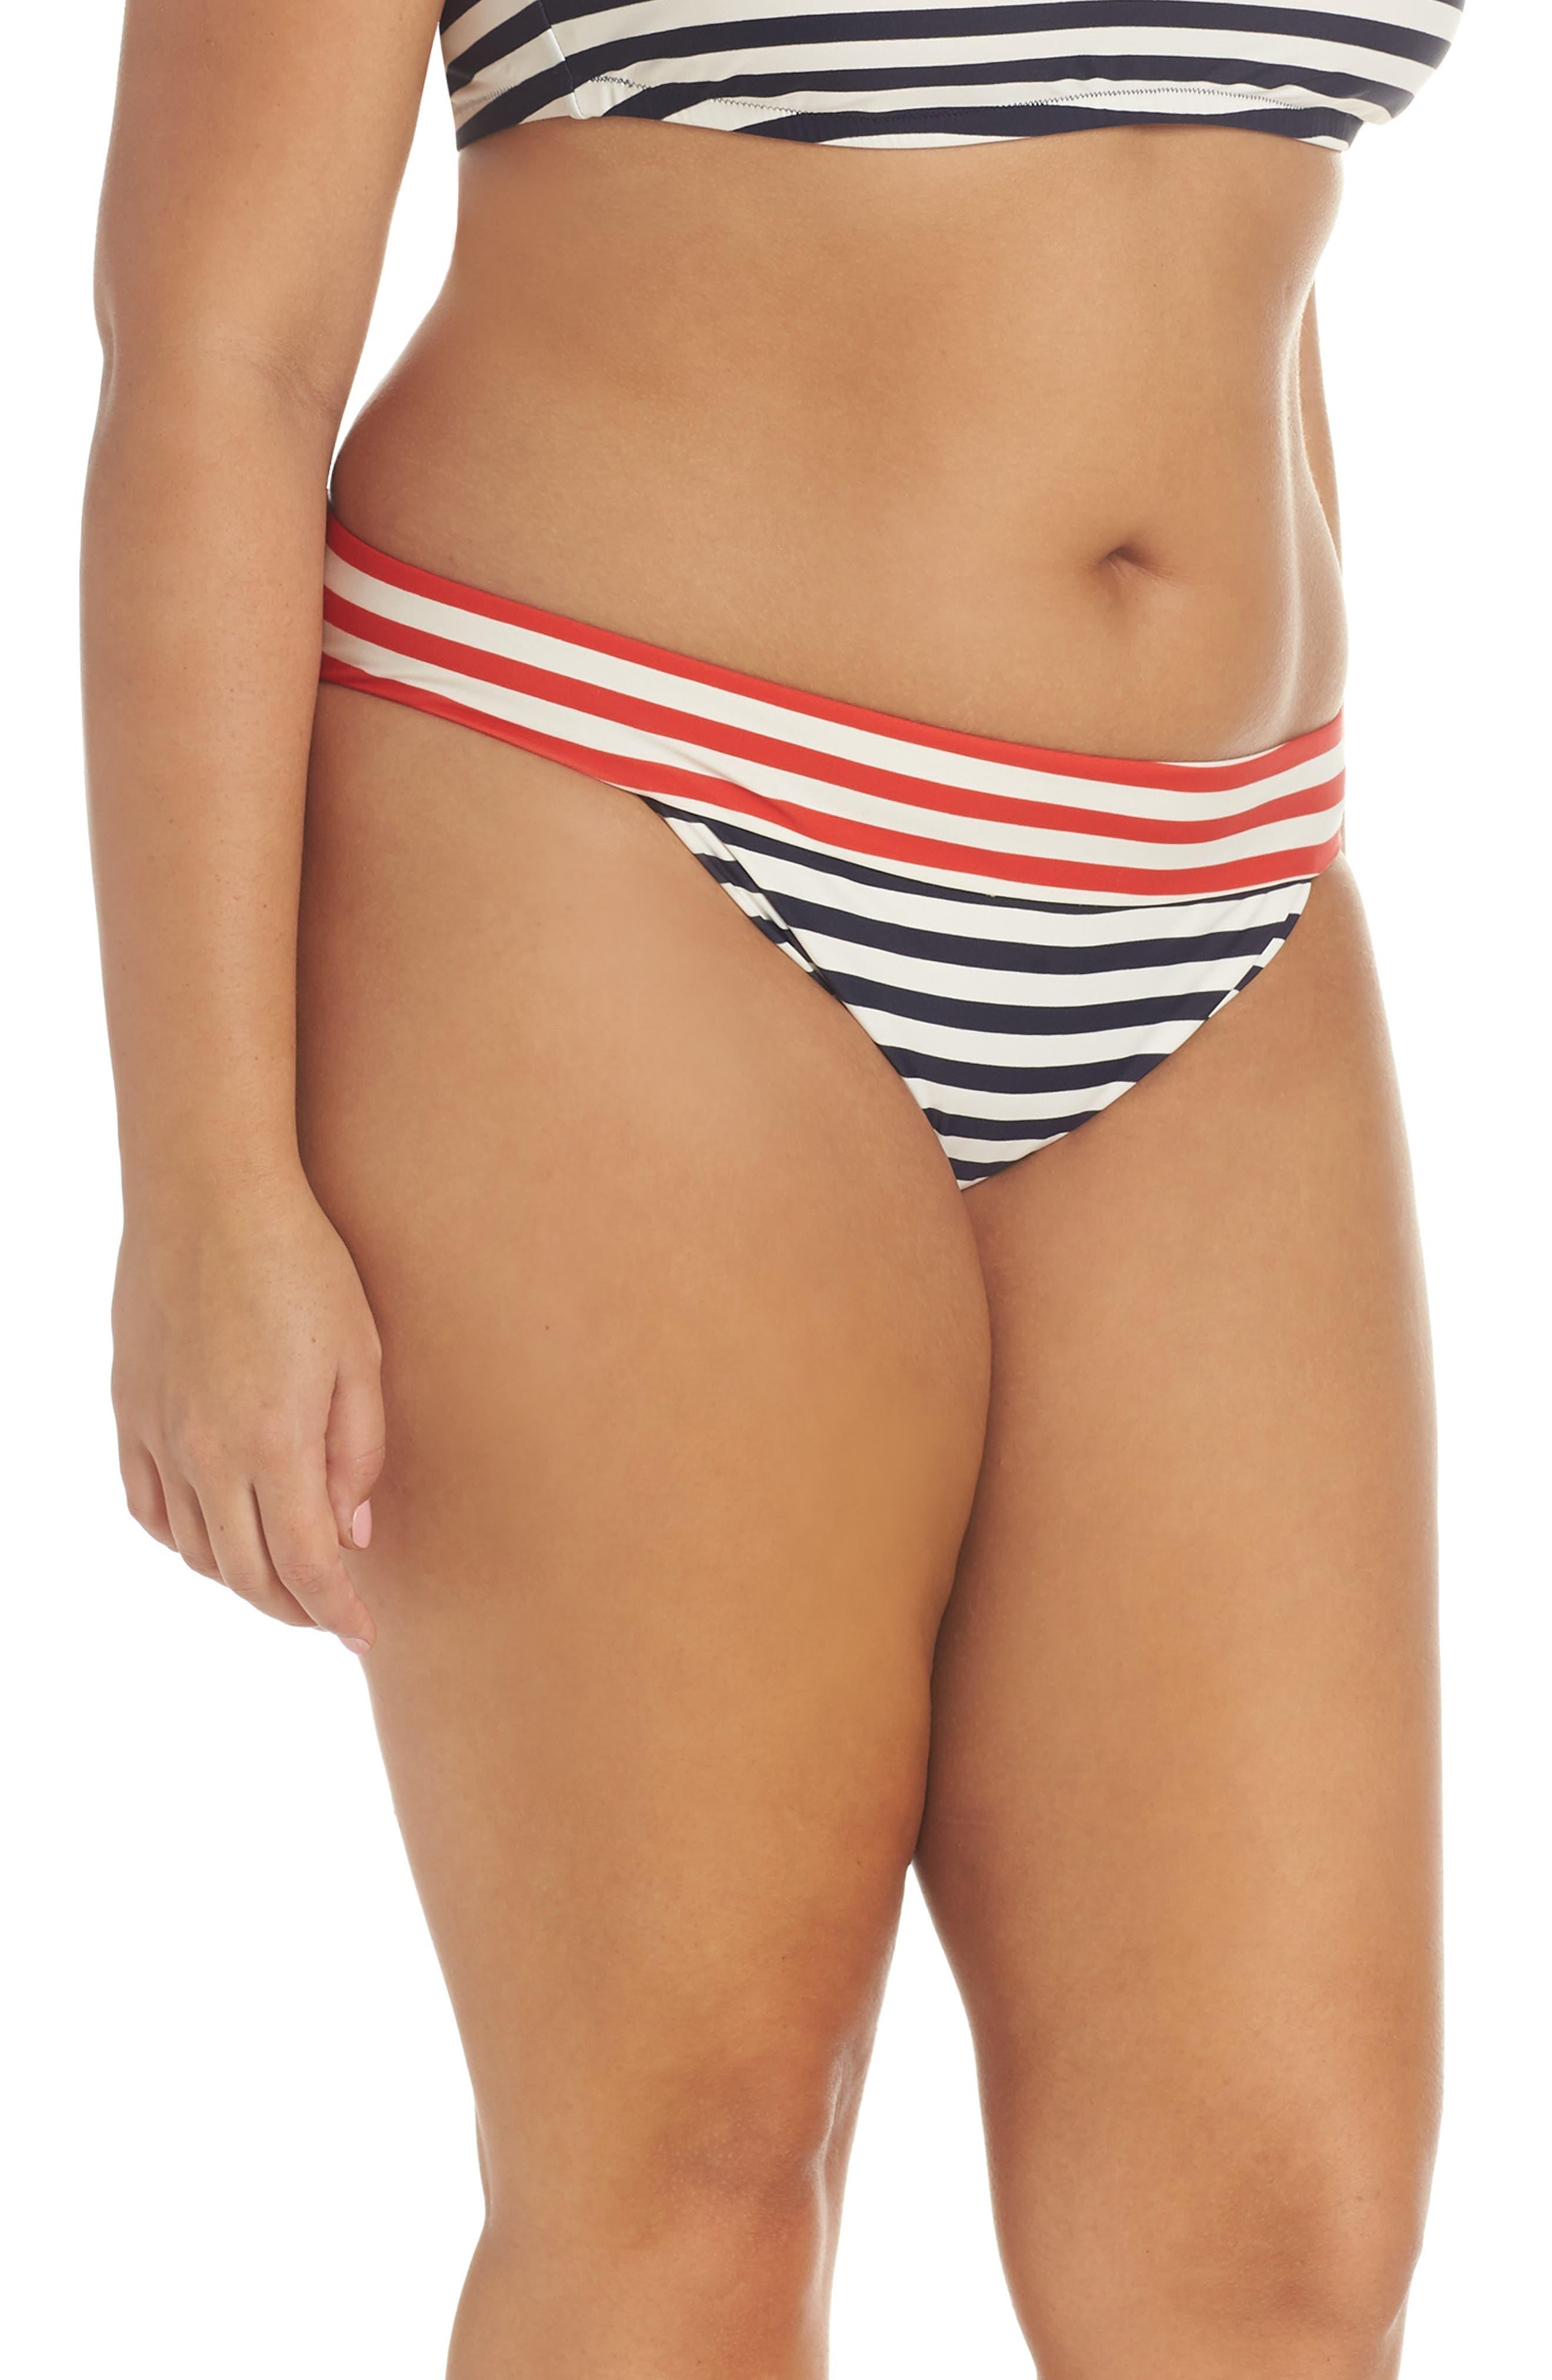 Stripe Banded Bikini Bottoms,                             Alternate thumbnail 3, color,                             NAVY VIVID FLAME